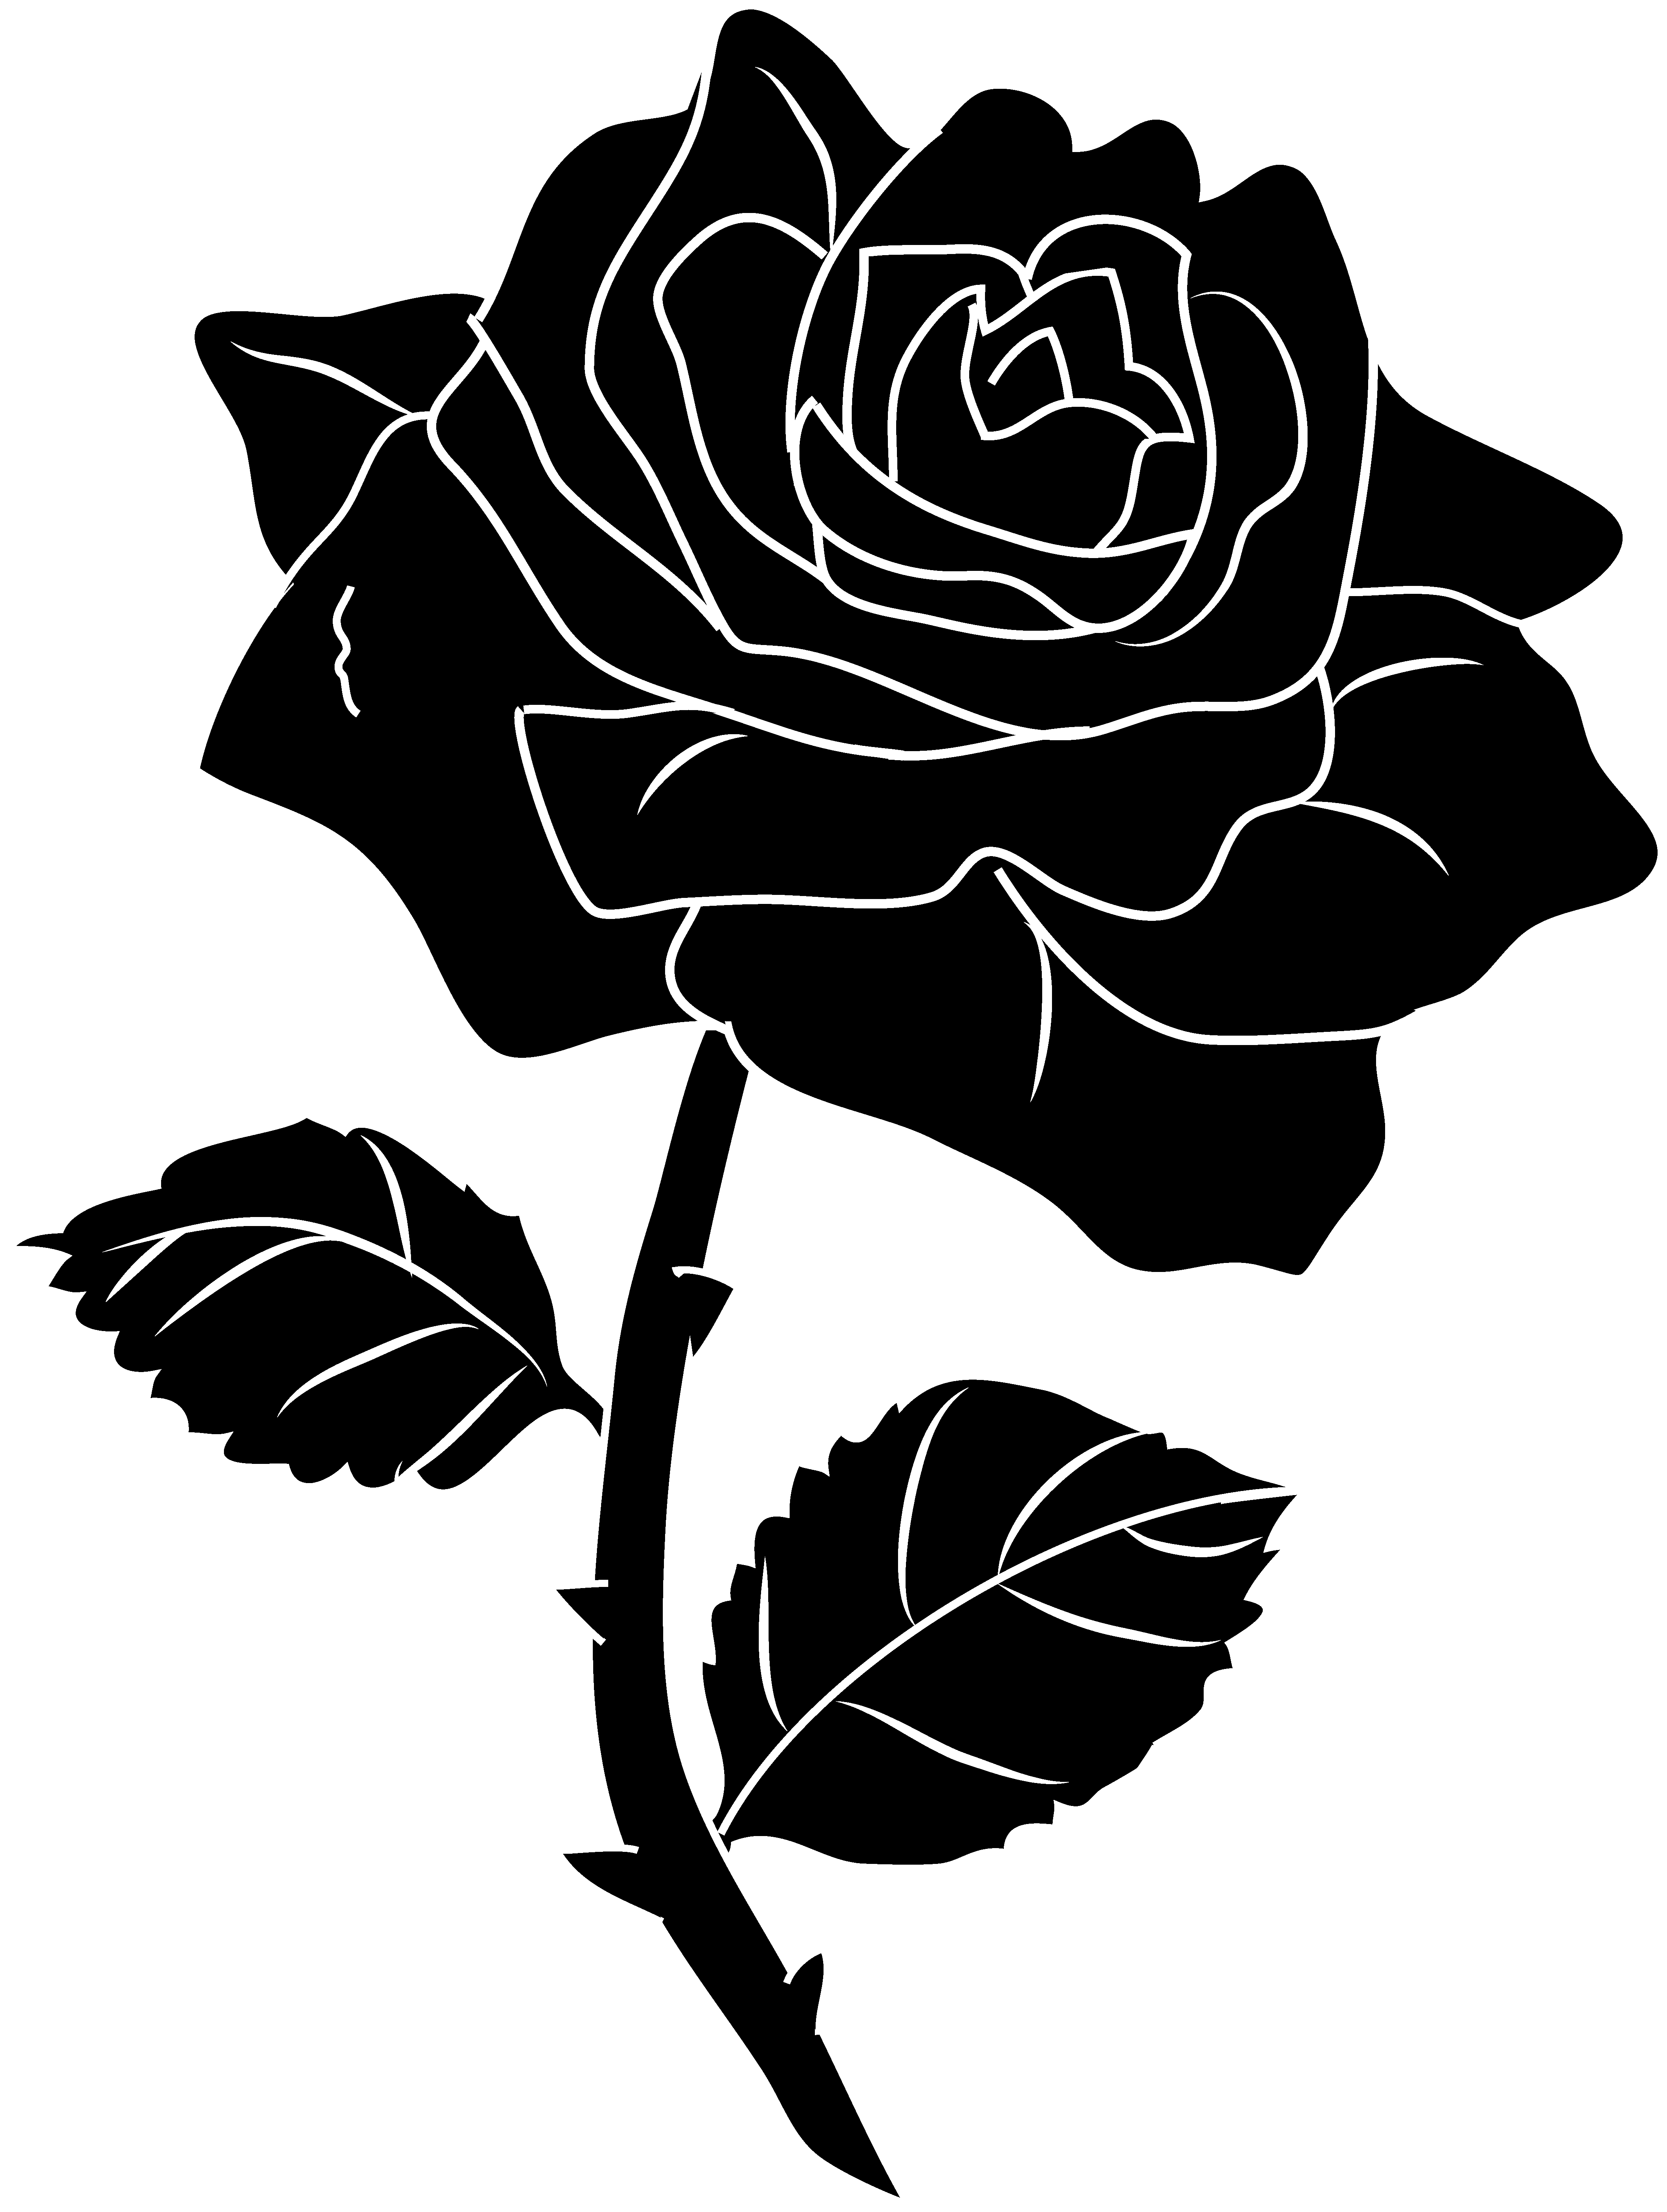 knumathise: Rose Clip Art Outline Images - Black and White Rose Print